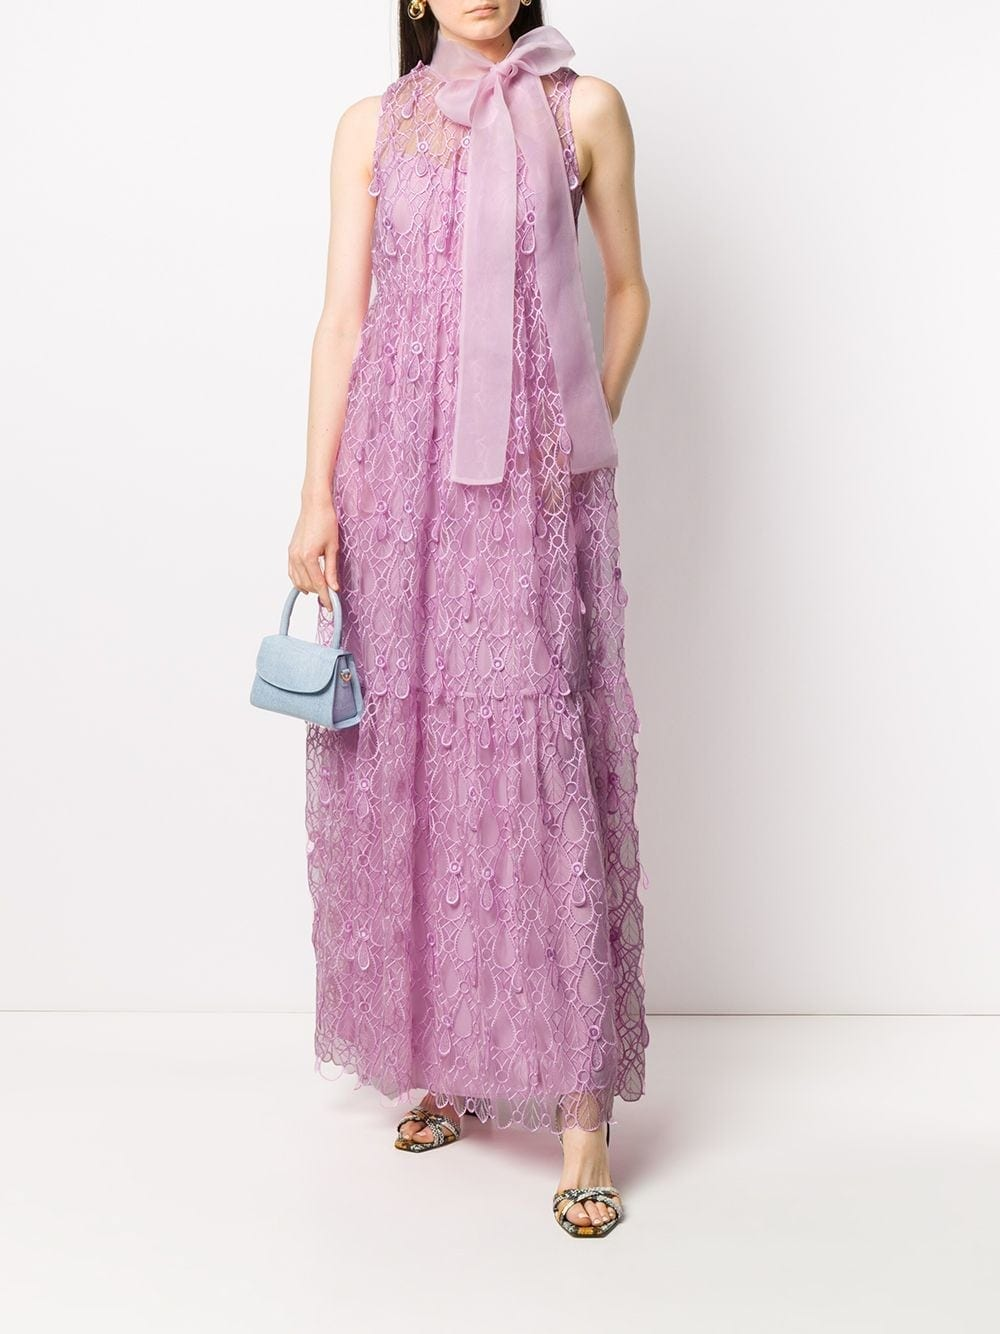 SELF-PORTRAIT Embroidered Teardrop Dress